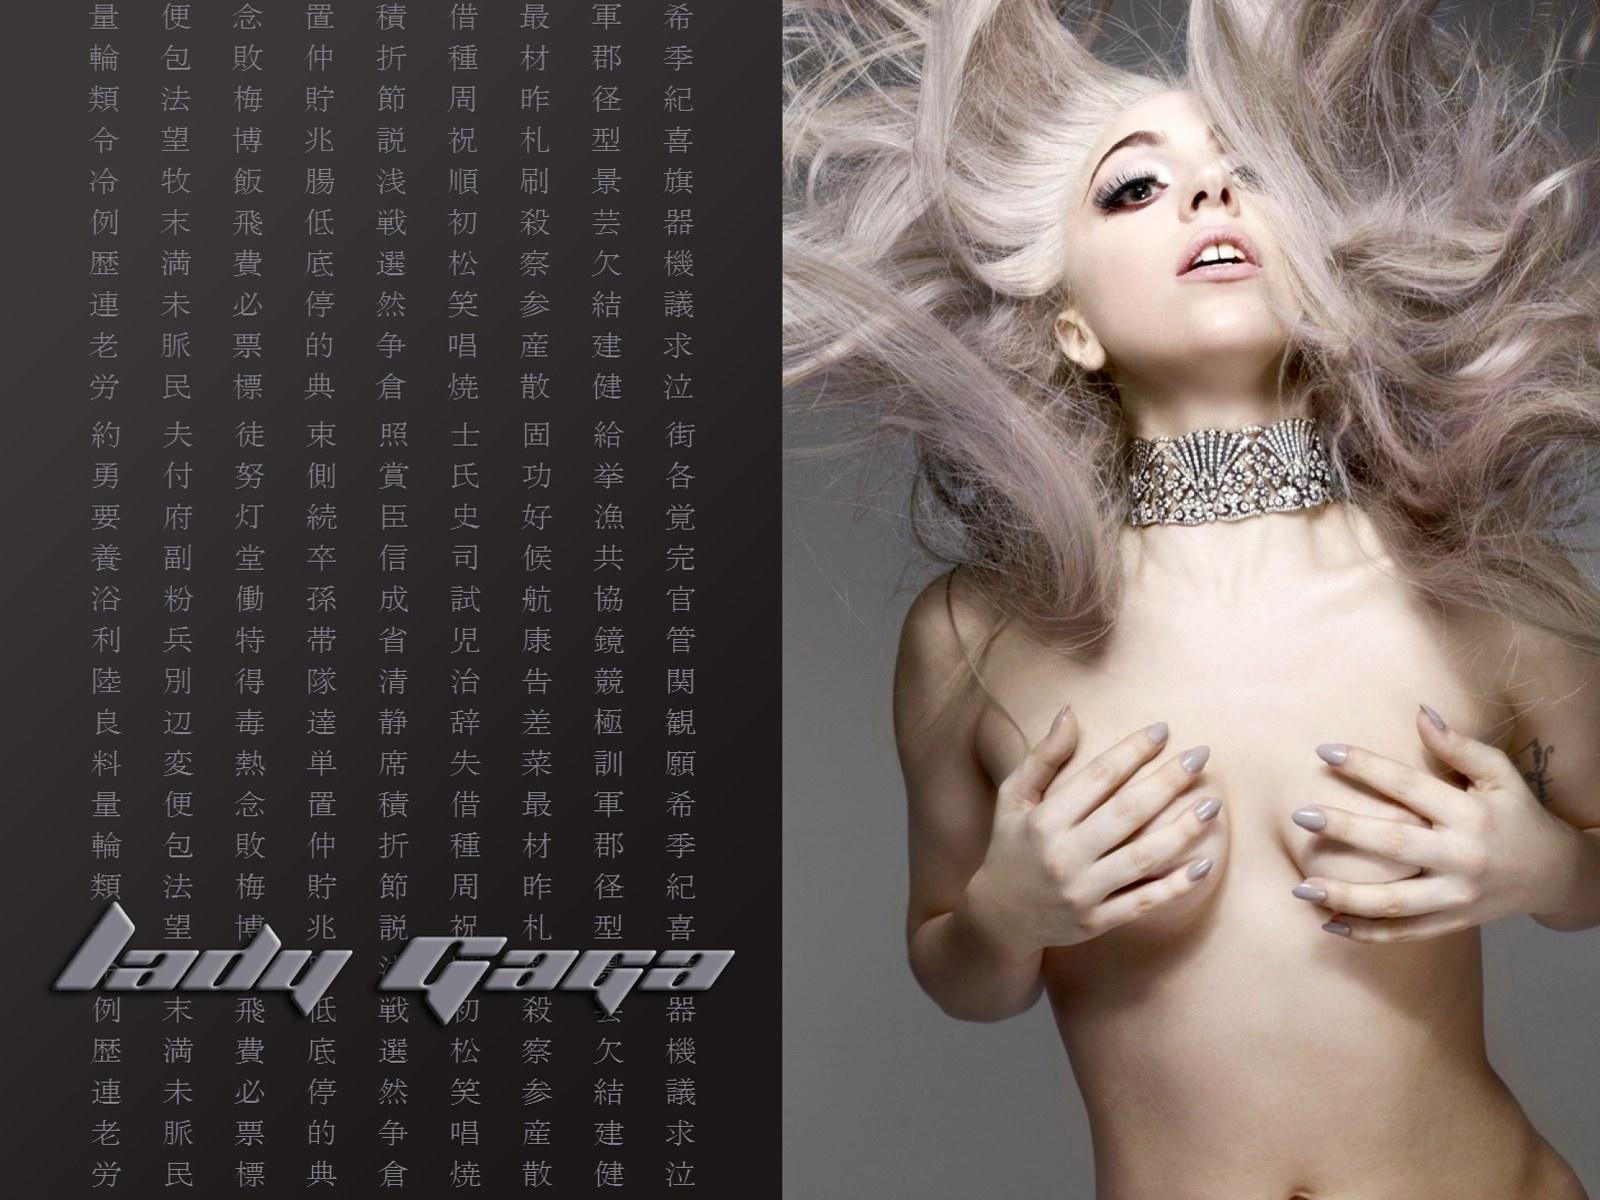 http://2.bp.blogspot.com/-LC87QhsKo-s/TtOY49CBbRI/AAAAAAAAFLs/V2F2yTuFUfs/s1600/sploogeblog_lady_gaga_naked_topless_castsuit_wallpaper_02.jpg